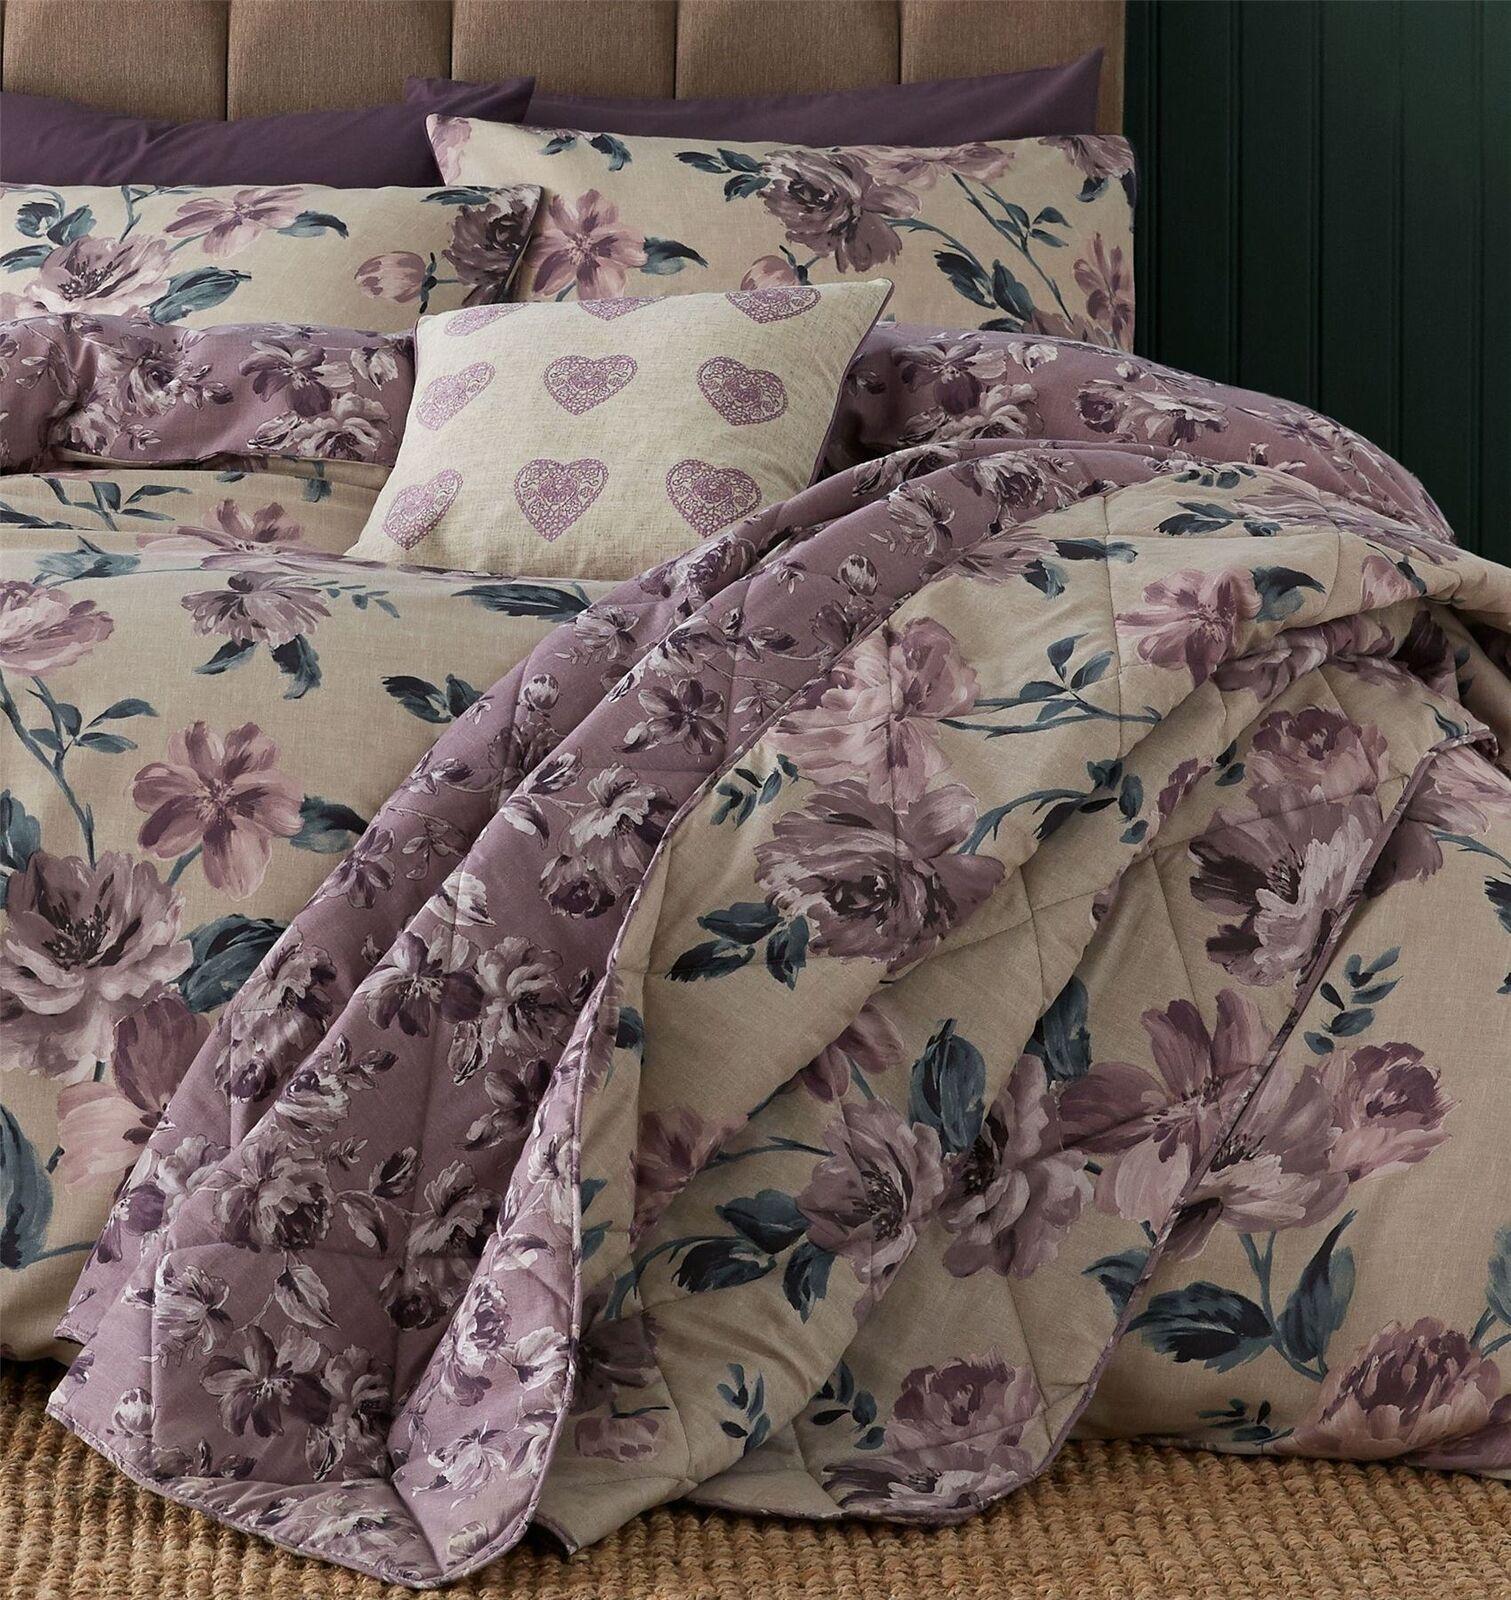 PAINTED-STYLE FLORAL FLOWERS BEIGE SINGLE DUVET COVER & BEDSPREAD 220X230CM Bedding